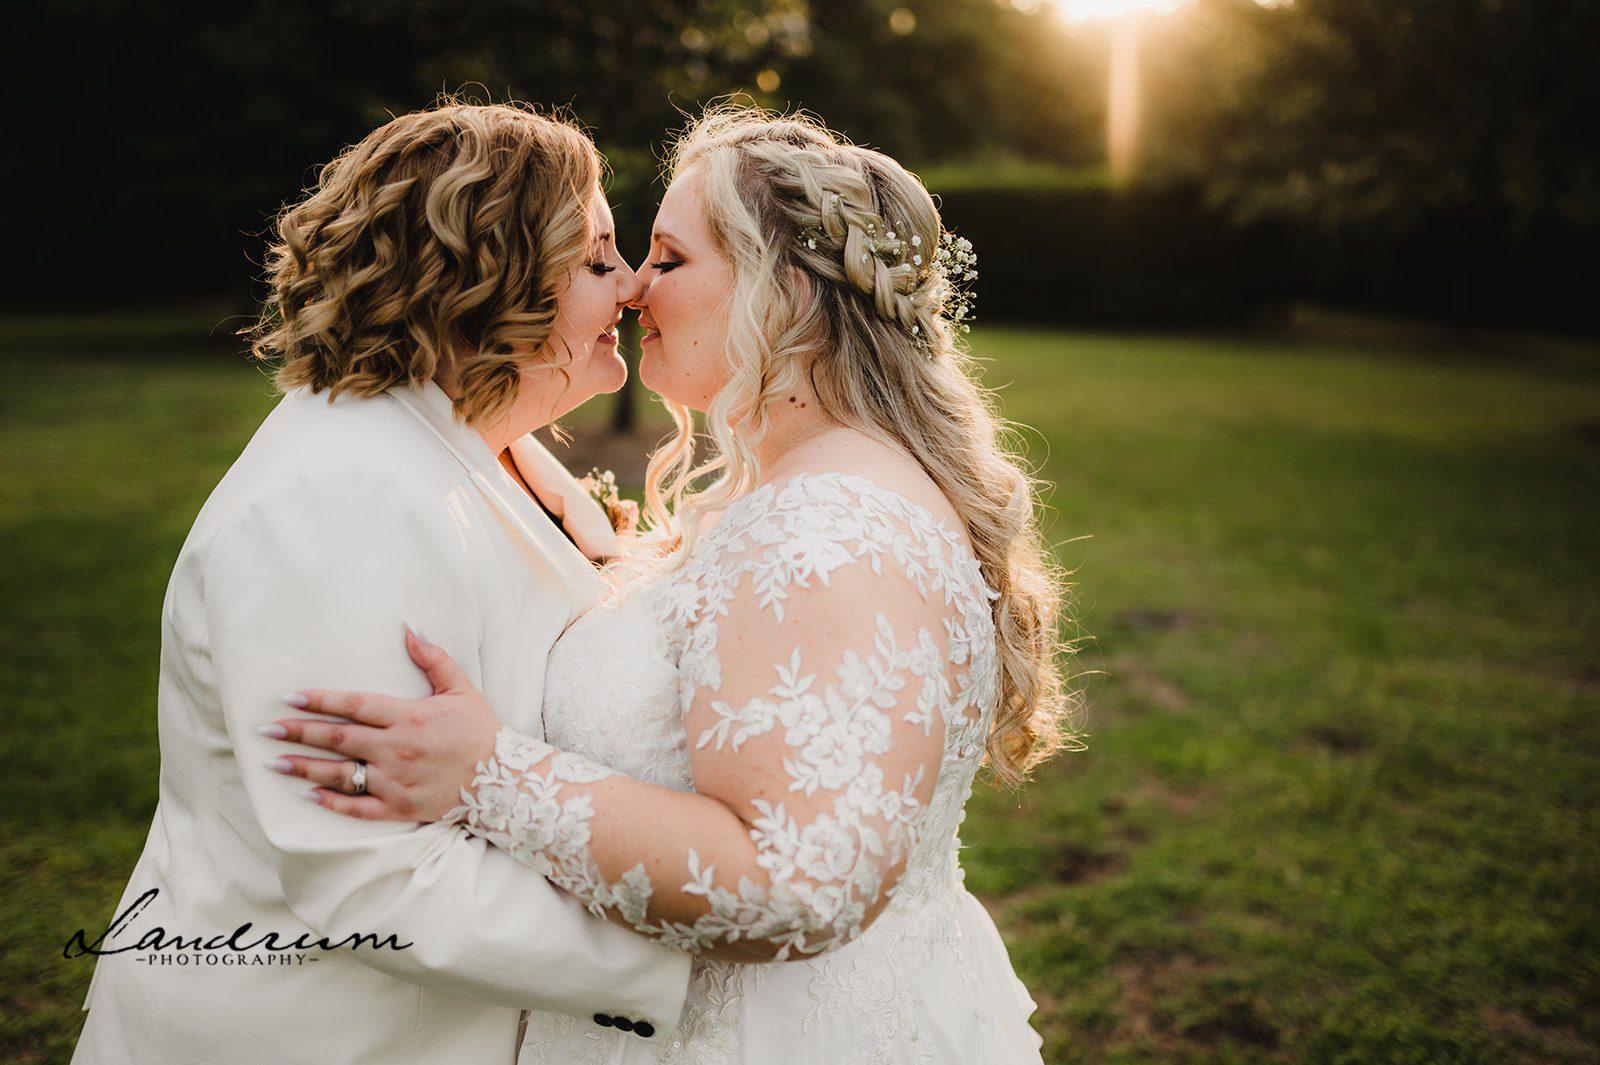 LGBTQ+ wedding veue